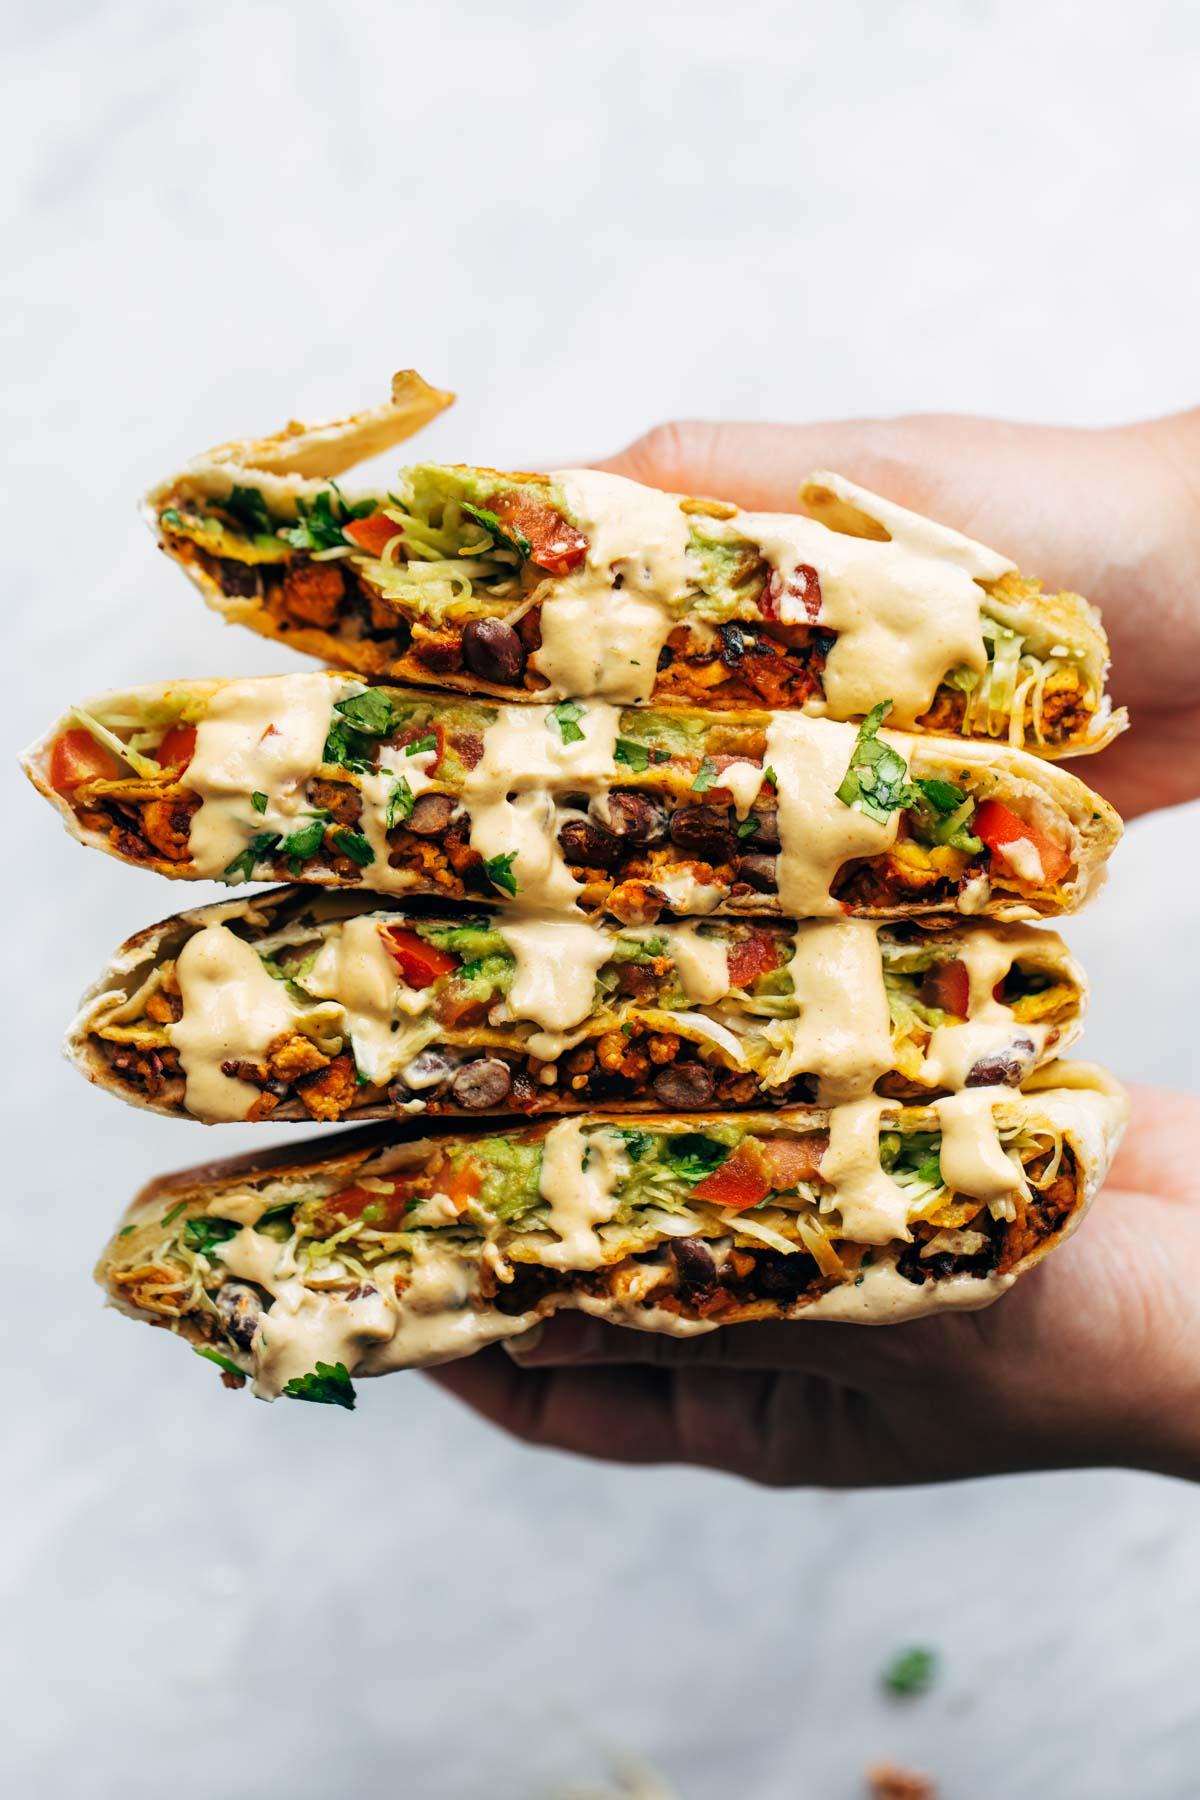 Vegan crunch wrap meat free plant based